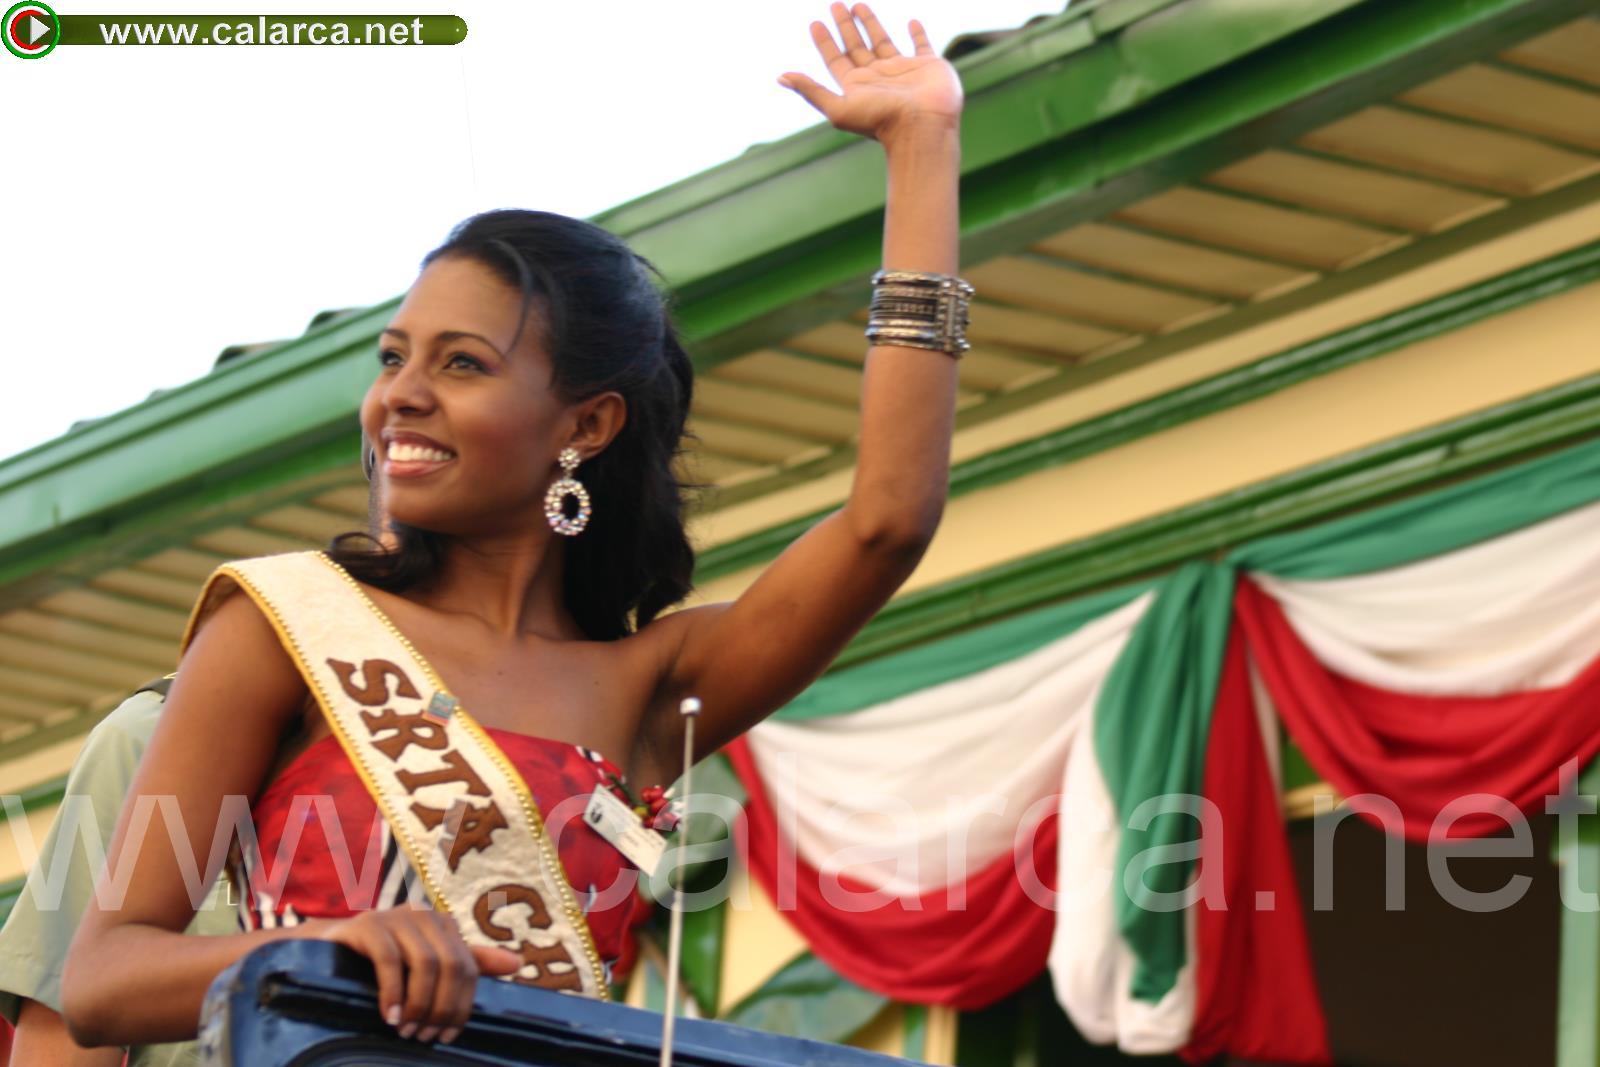 Chocó - Kenia Julieth Arias Córdoba